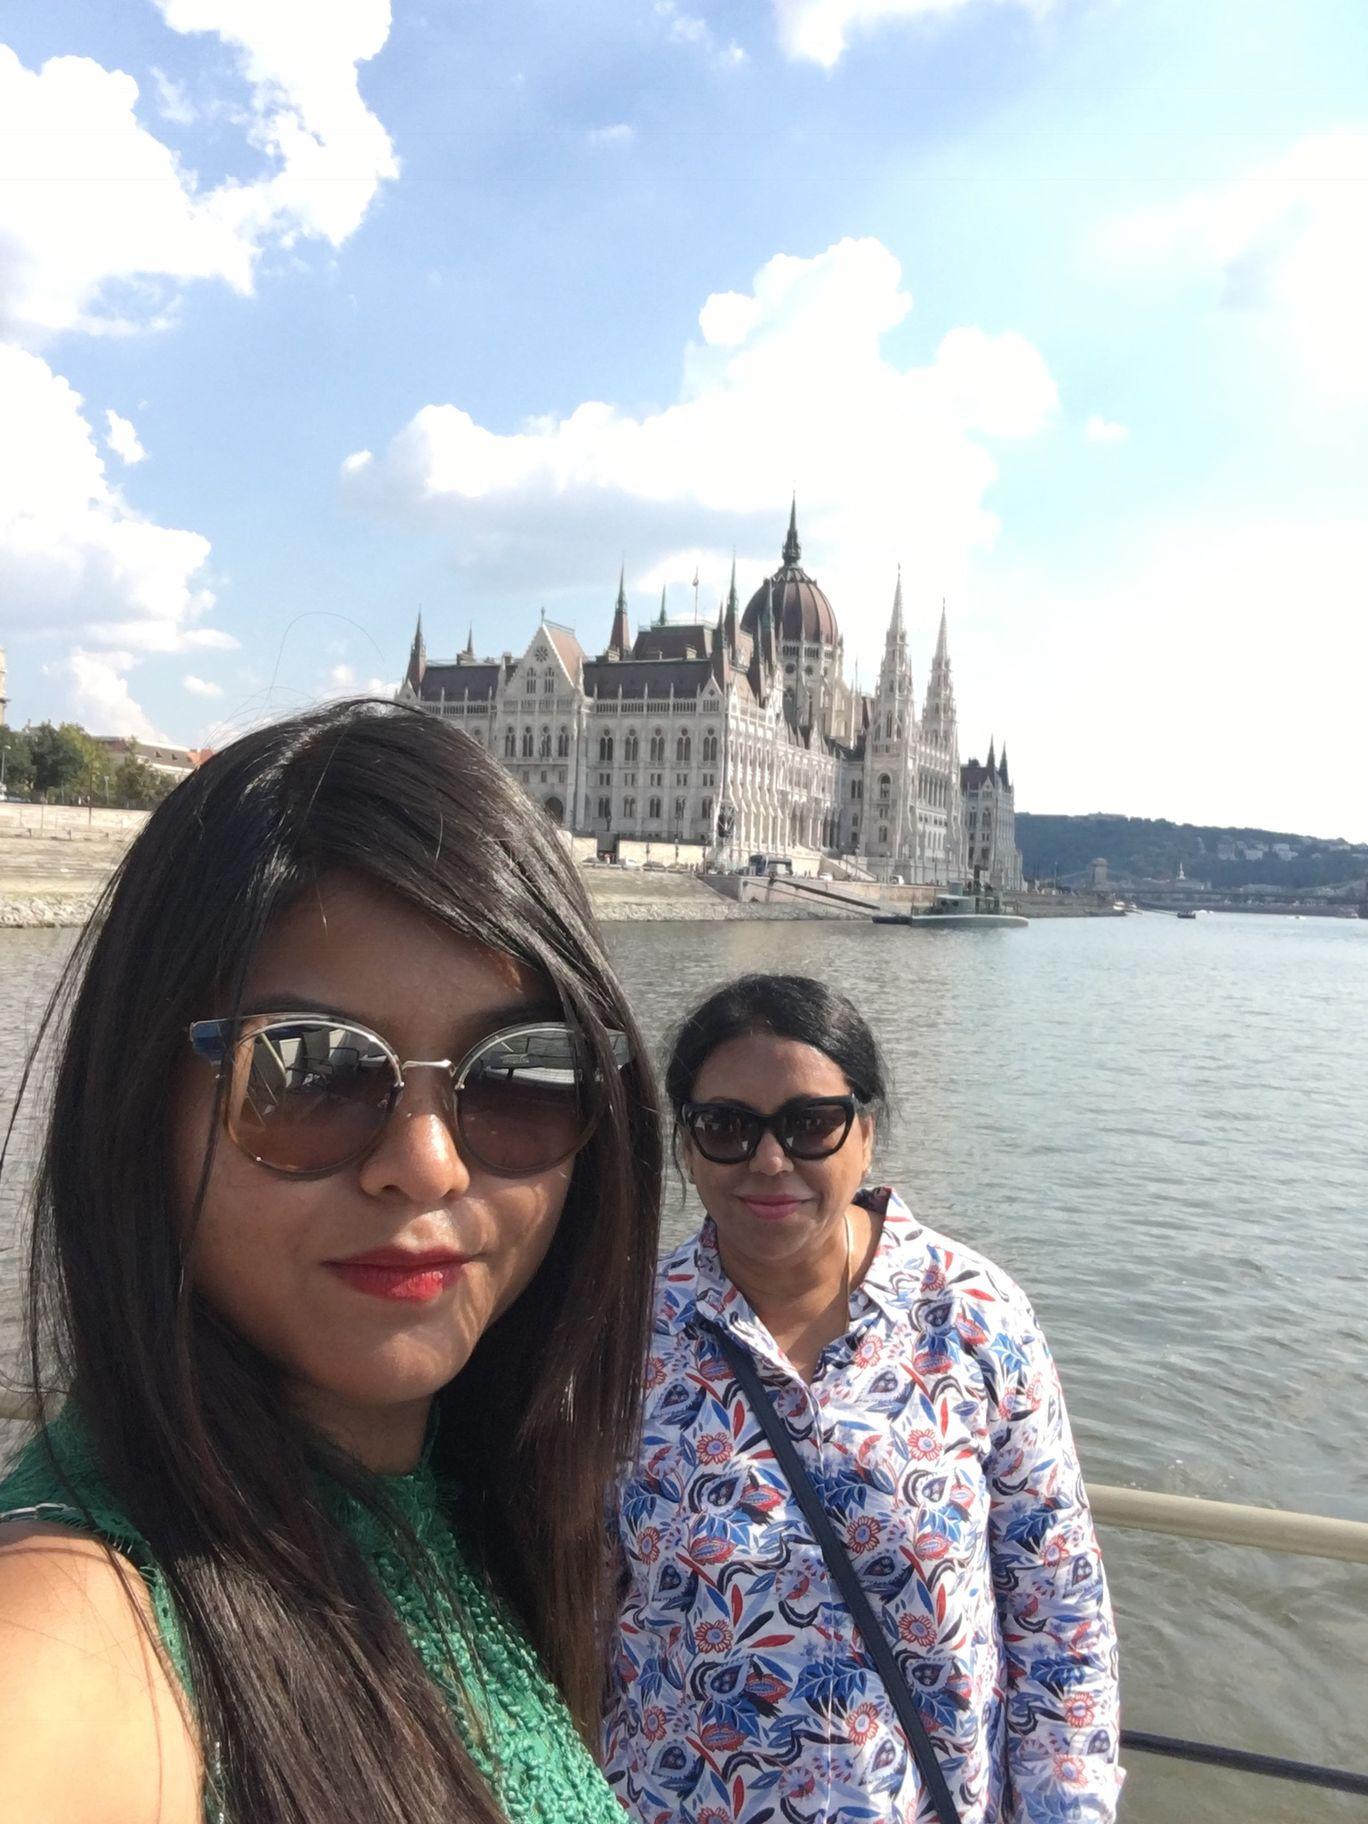 Photo of Budapest By Mridusmeeta Boro